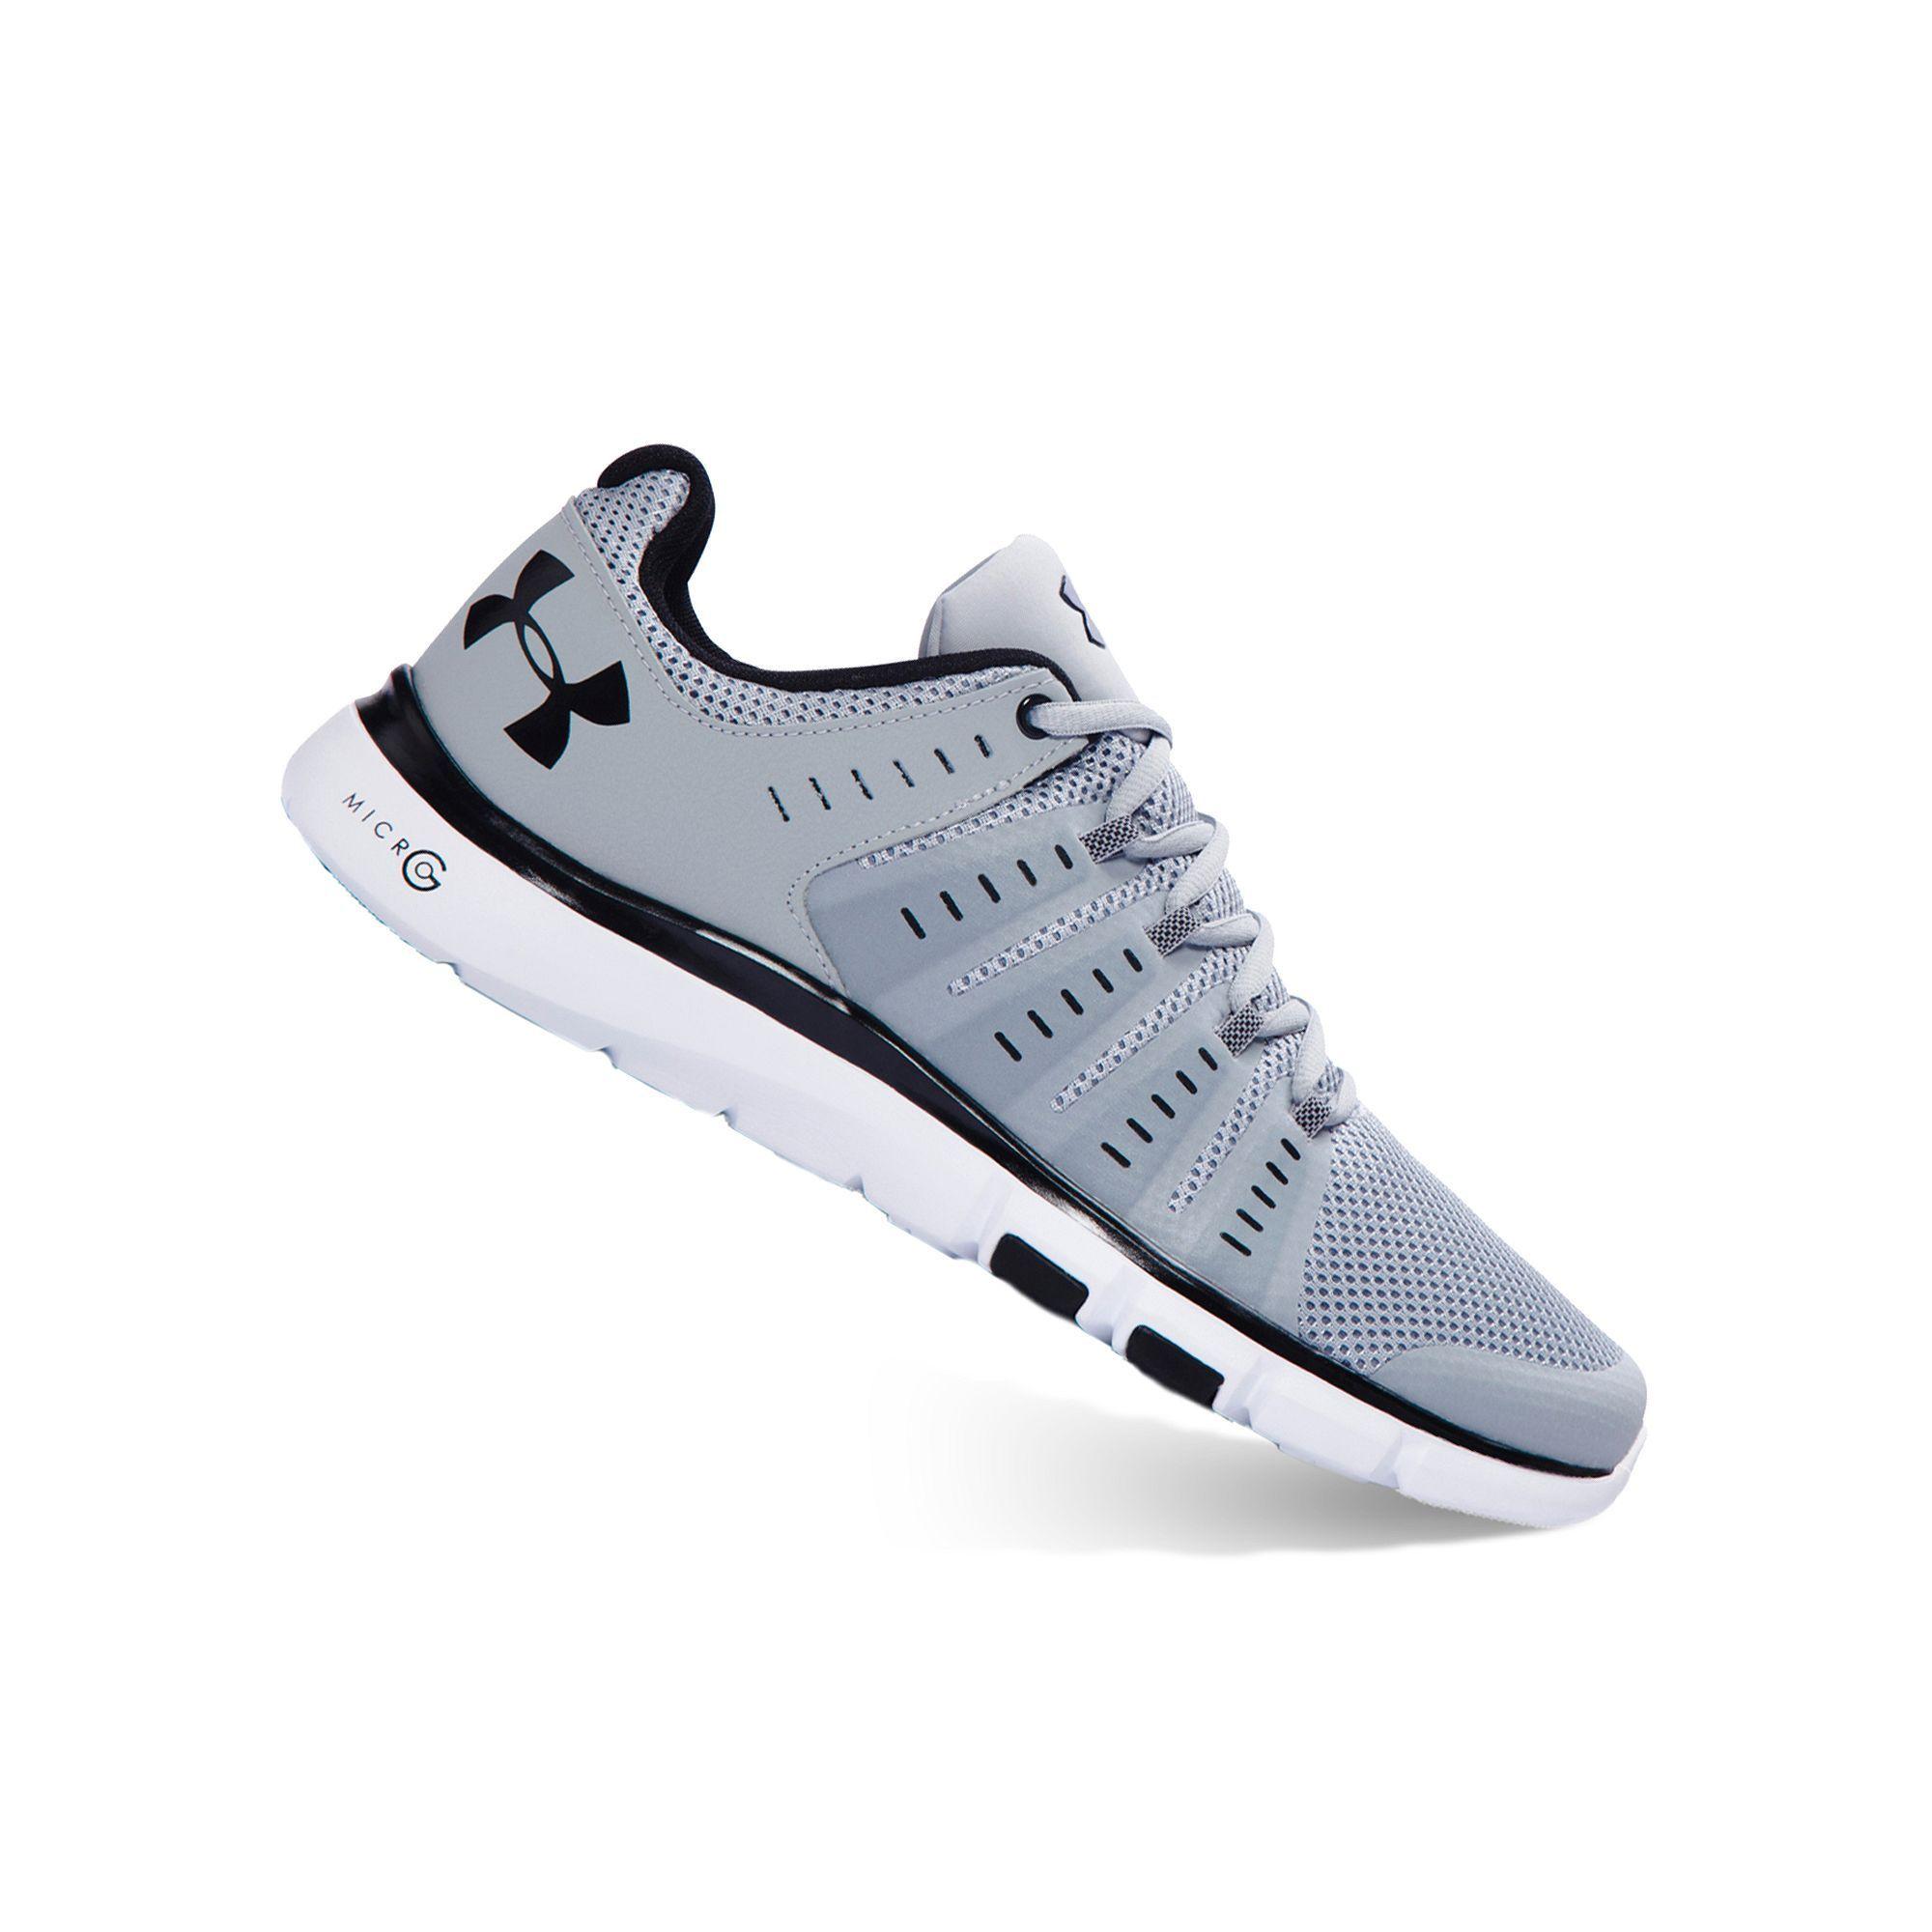 finest selection 02d9c c38b2 Under Armour Micro G Limitless 2 Men's Training Shoes ...